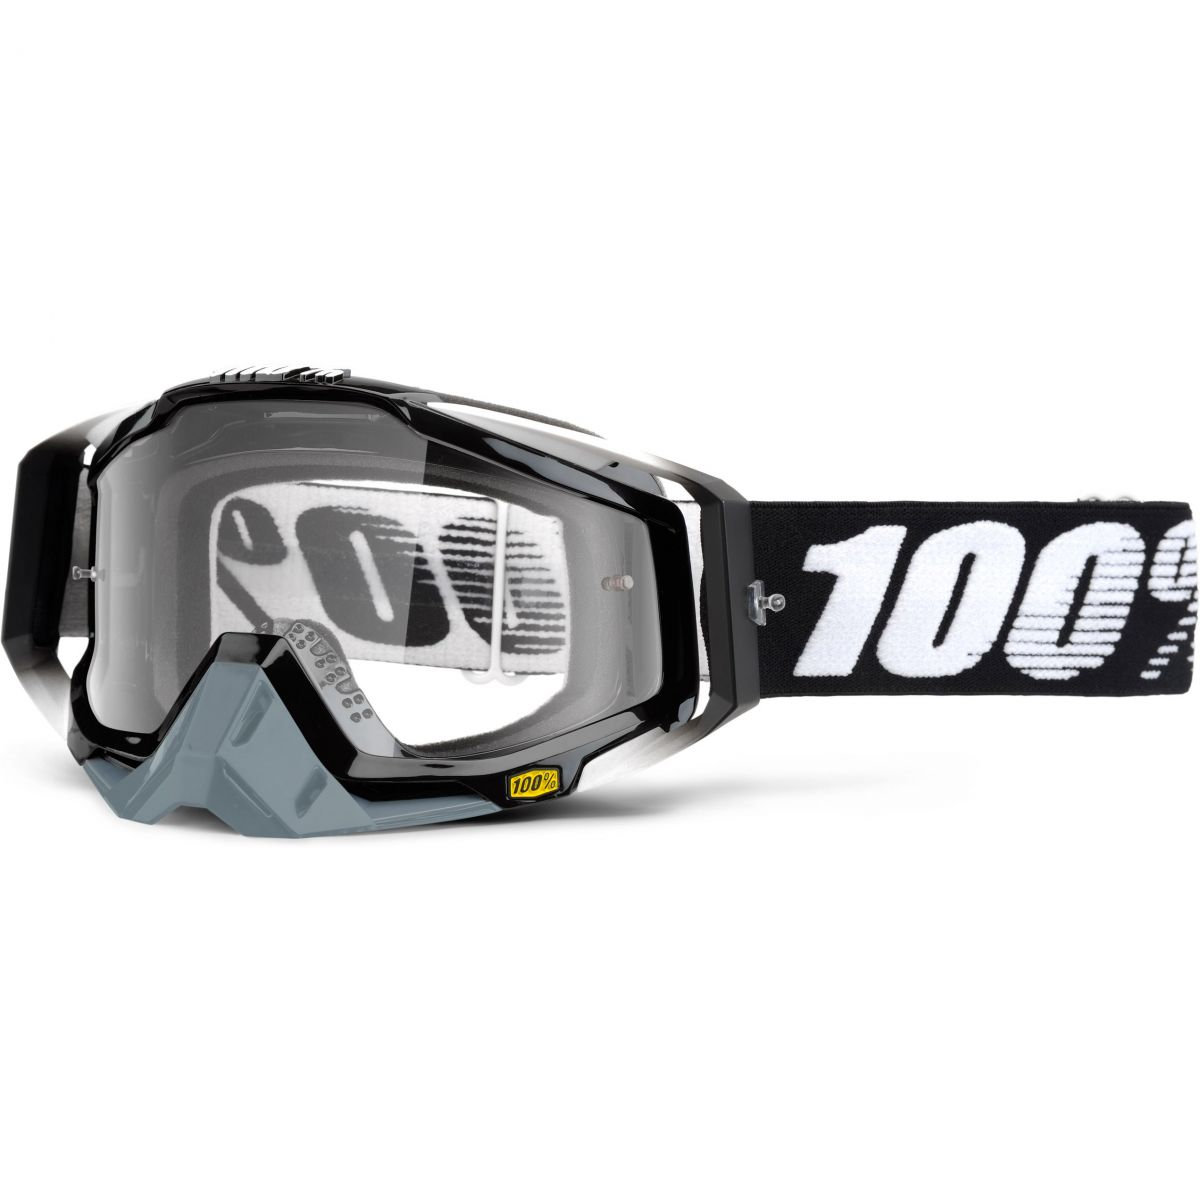 100% - Racecraft Abyss Black очки, прозрачная линза